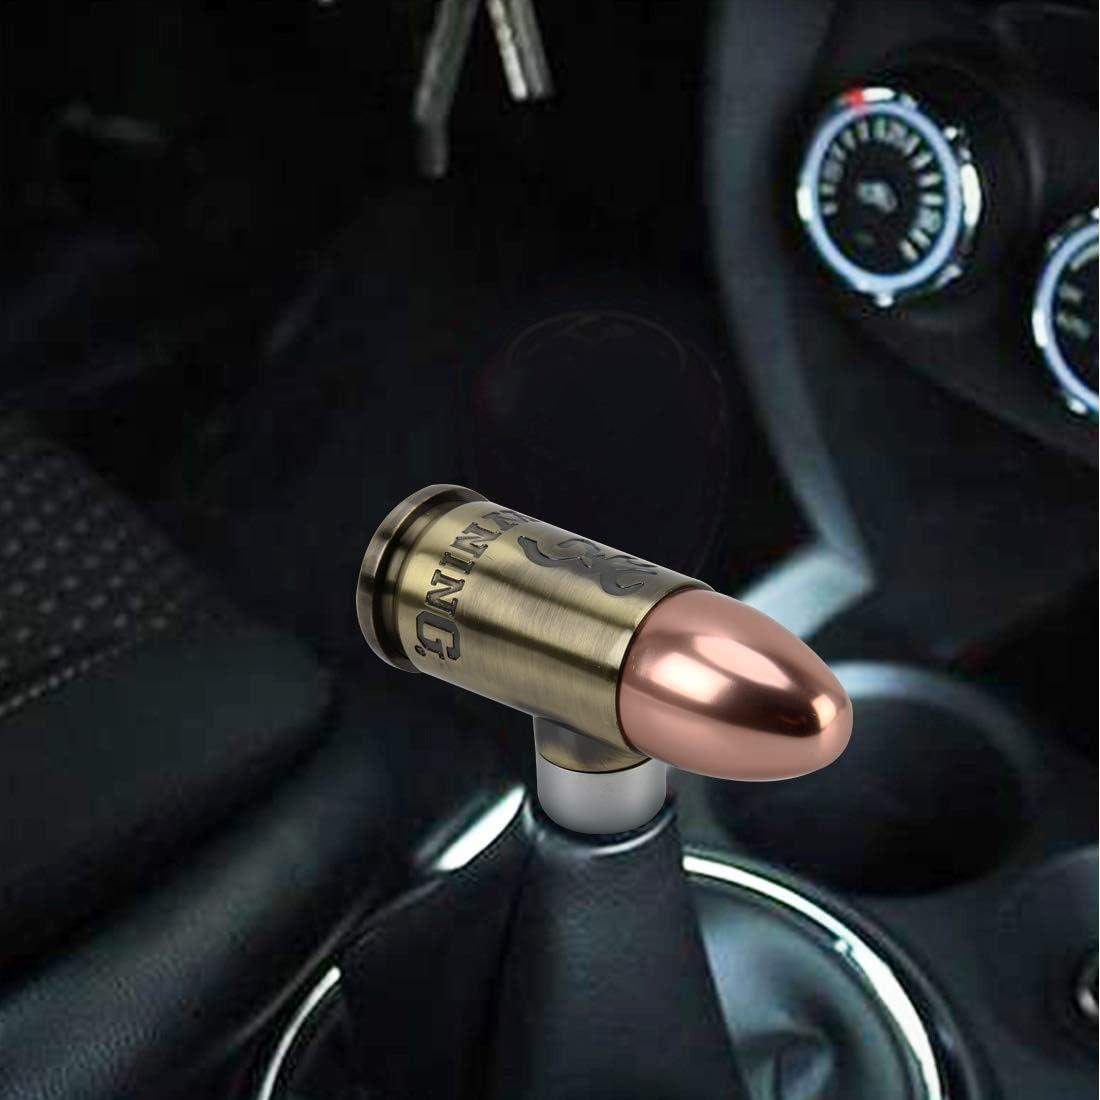 Gear shift knob Universal Bullet Shape Car Gear Shift Knob Modified Car Gear Shift Knob Auto Transmission Shift Lever Knob Gear Knobs,Gearshift Gear shift